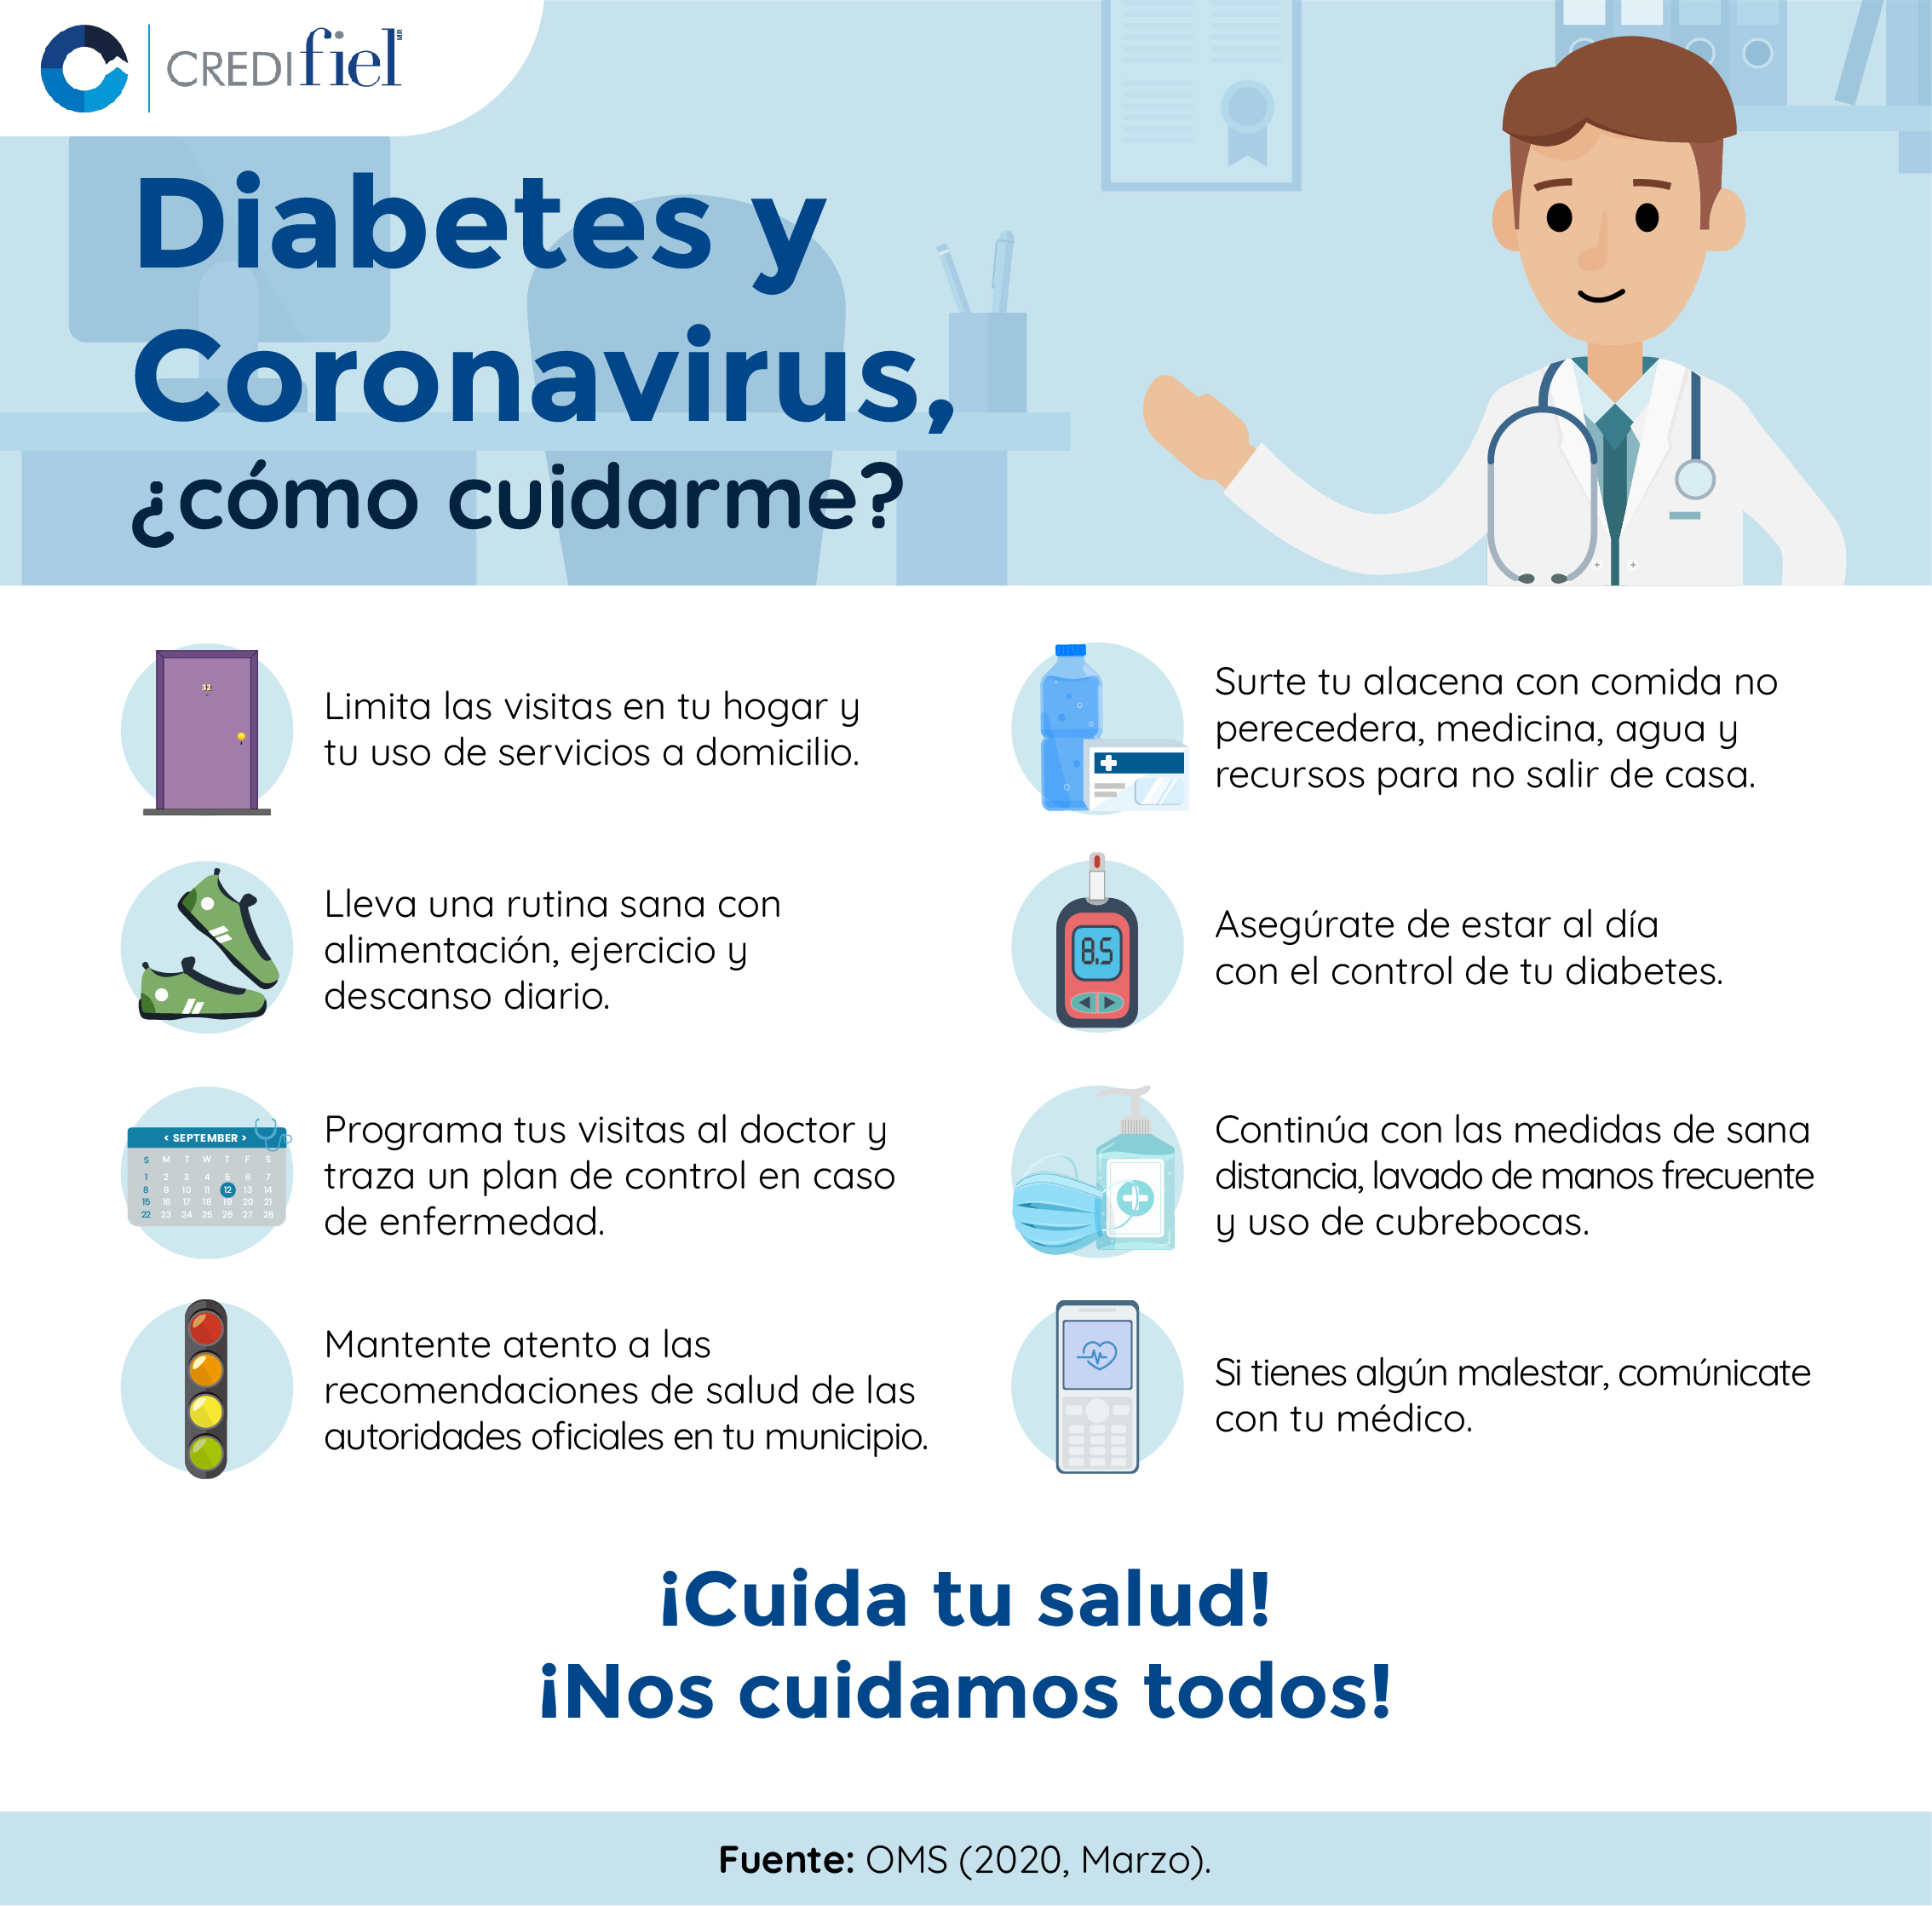 Blog-Infografia-diabetes-coronavirus-como-cuidarme-Sep20